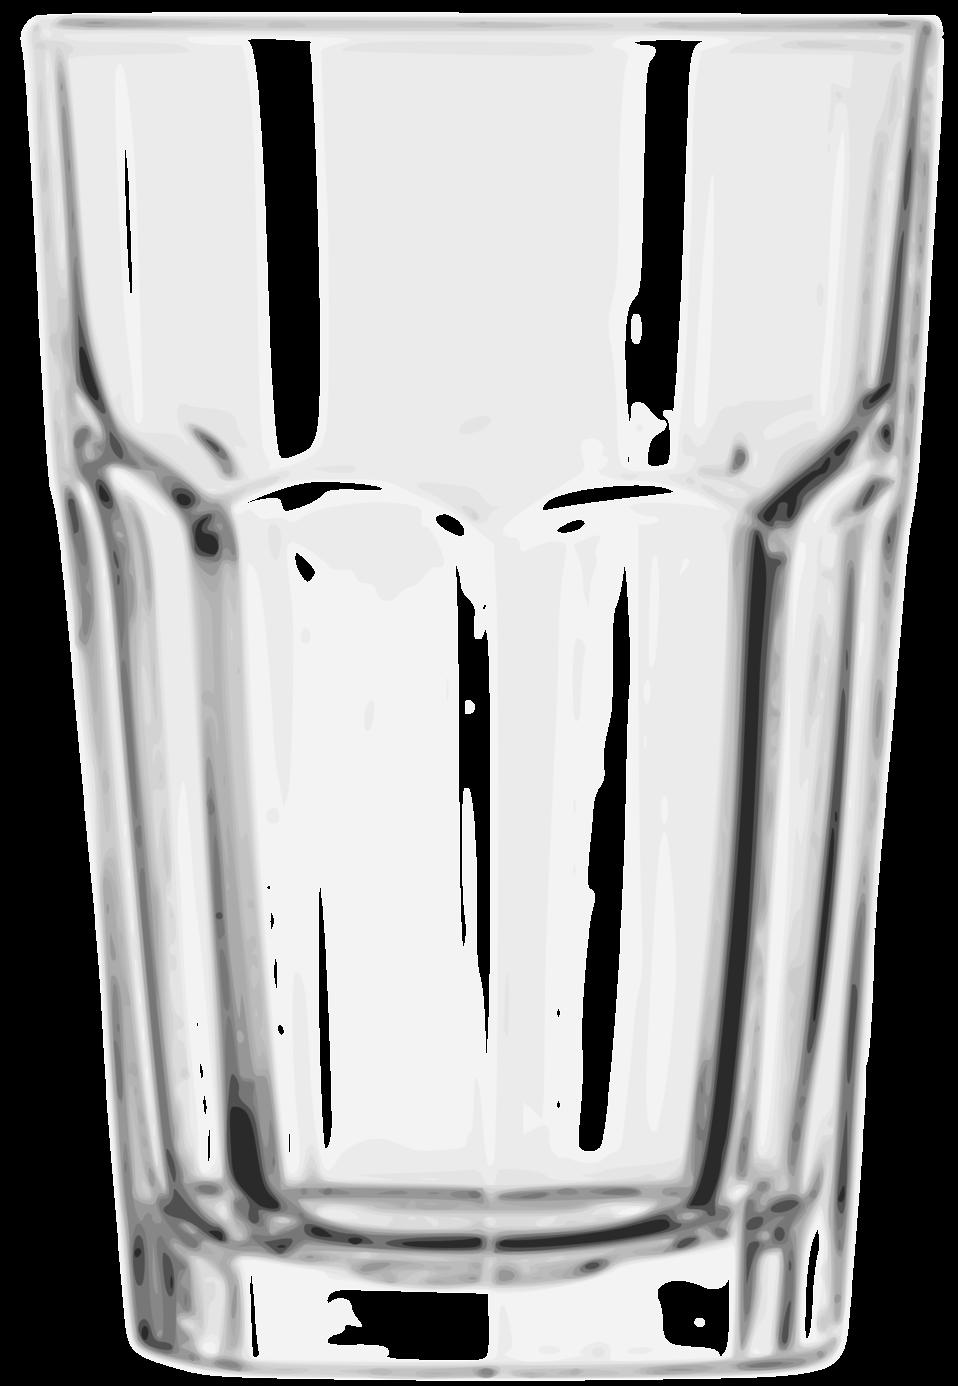 Public domain clip art. Glass clipart buttermilk